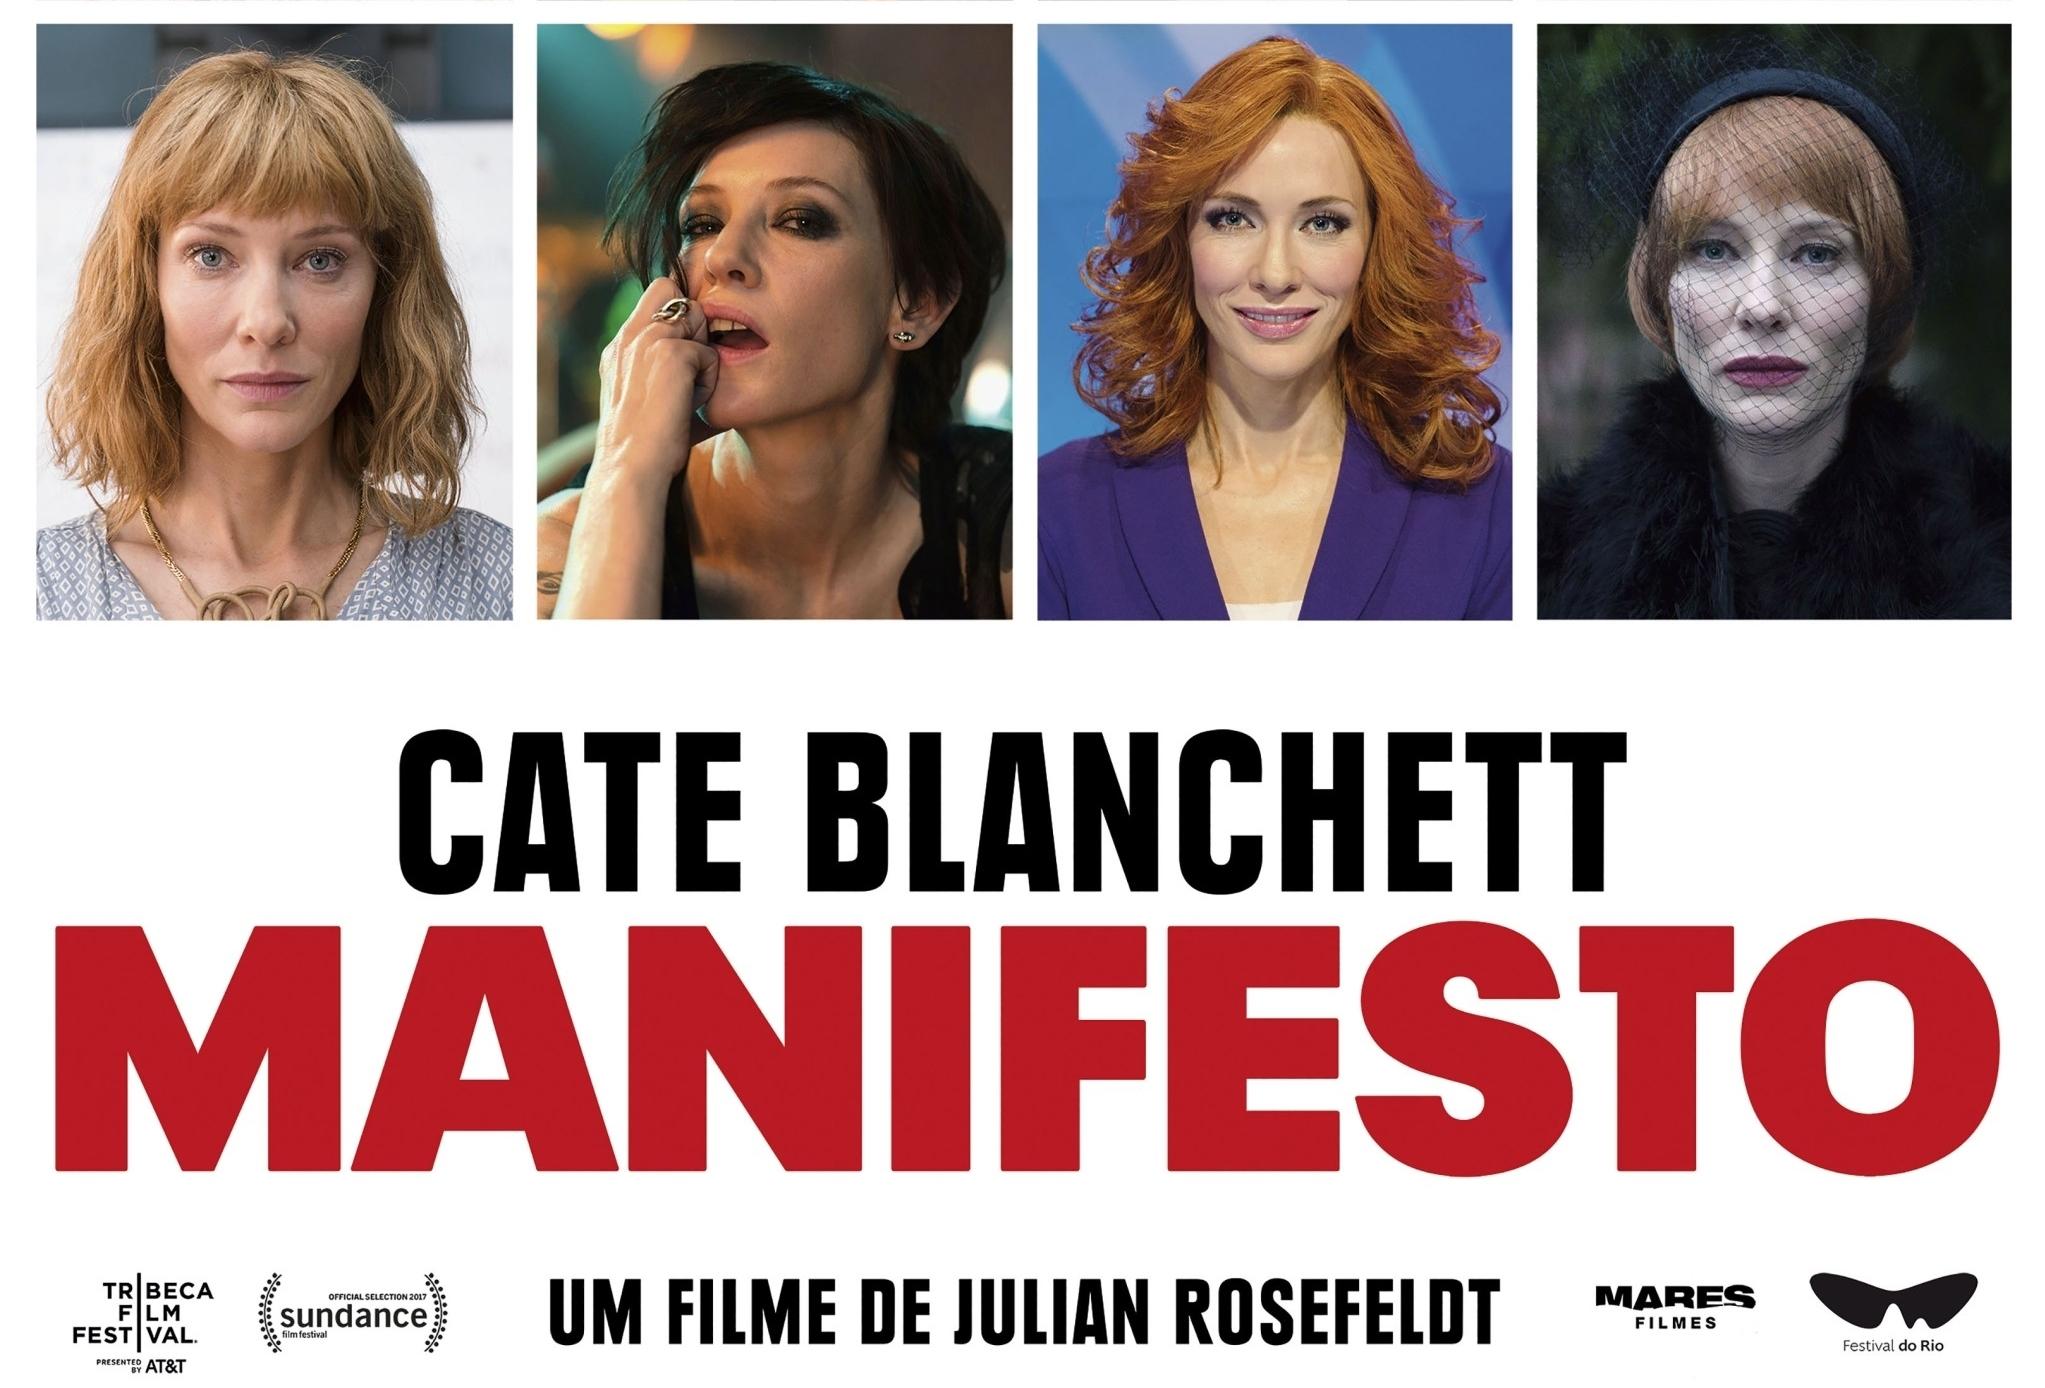 Rio de Janeiro International Film Festival and Parool Film Festival to screen 'Manifesto' by Julian Rosefeldt